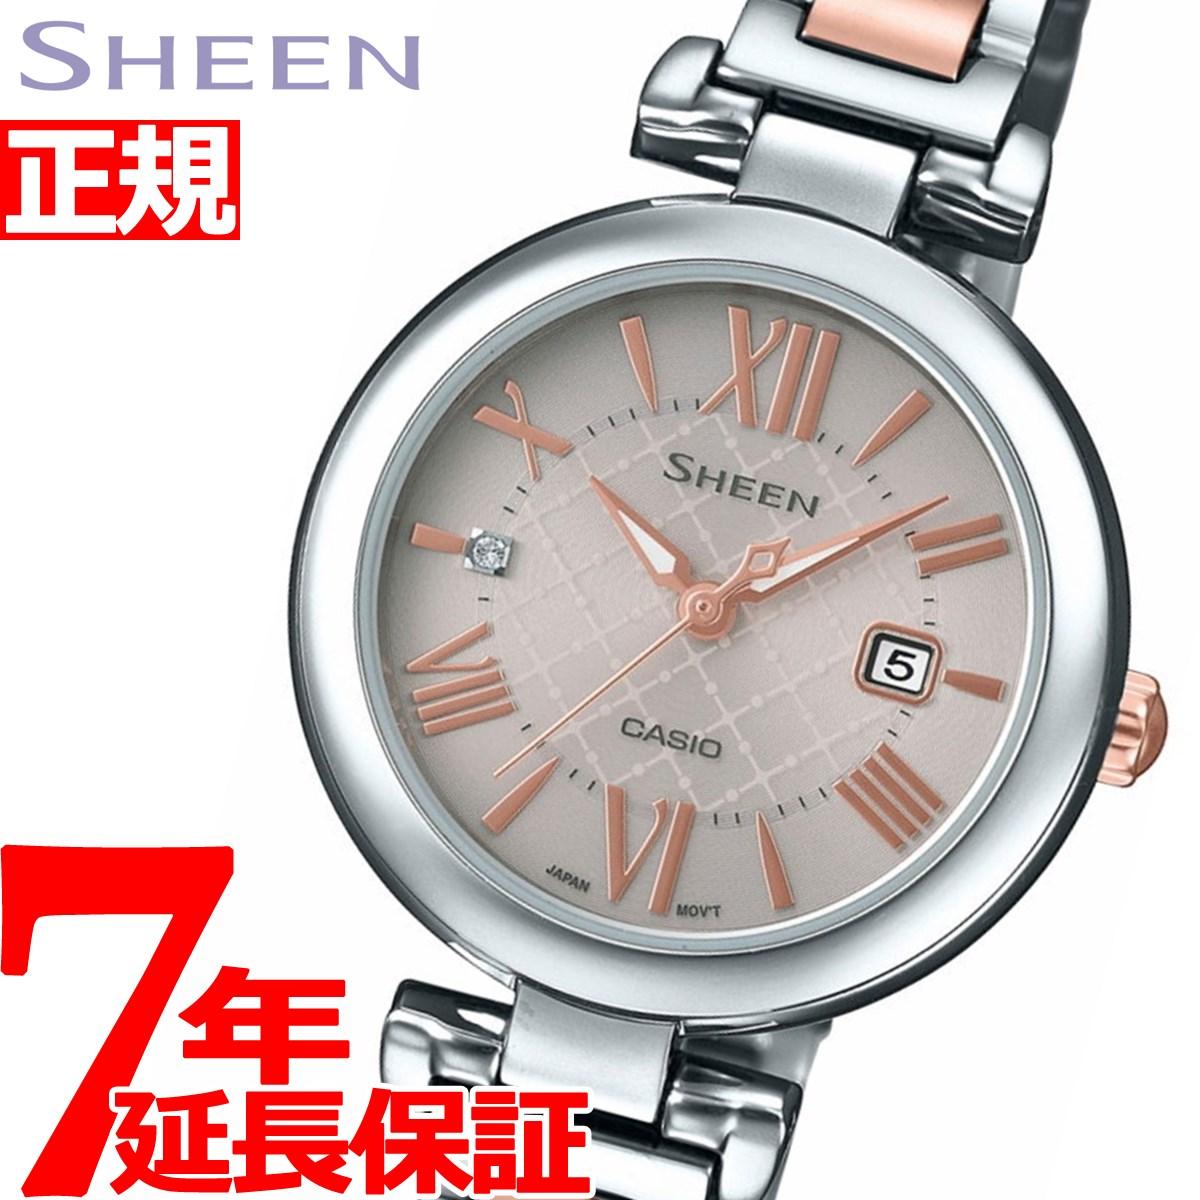 【SHOP OF THE YEAR 2018 受賞】カシオ シーン CASIO SHEEN ソーラー 腕時計 レディース SHS-4502SPG-9AJF